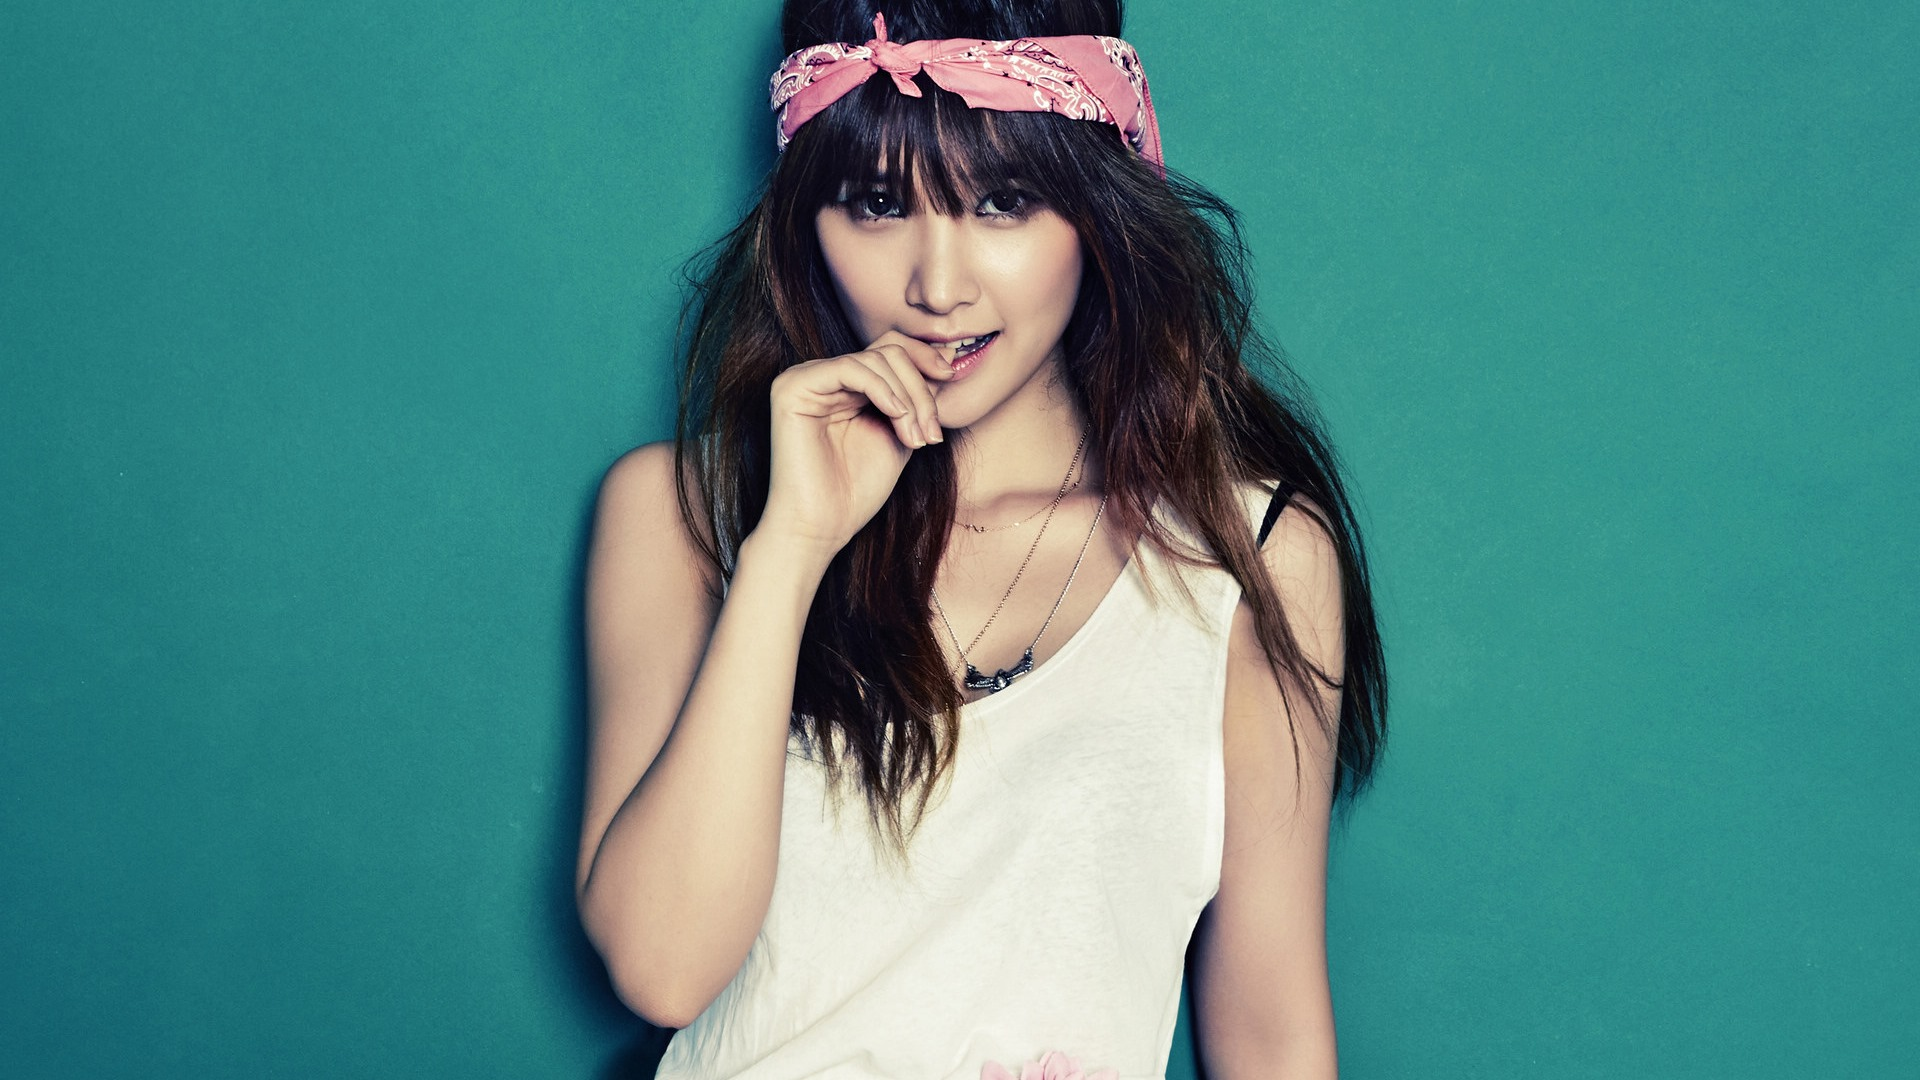 Spica Korean girls music idol combination HD wallpapers #22